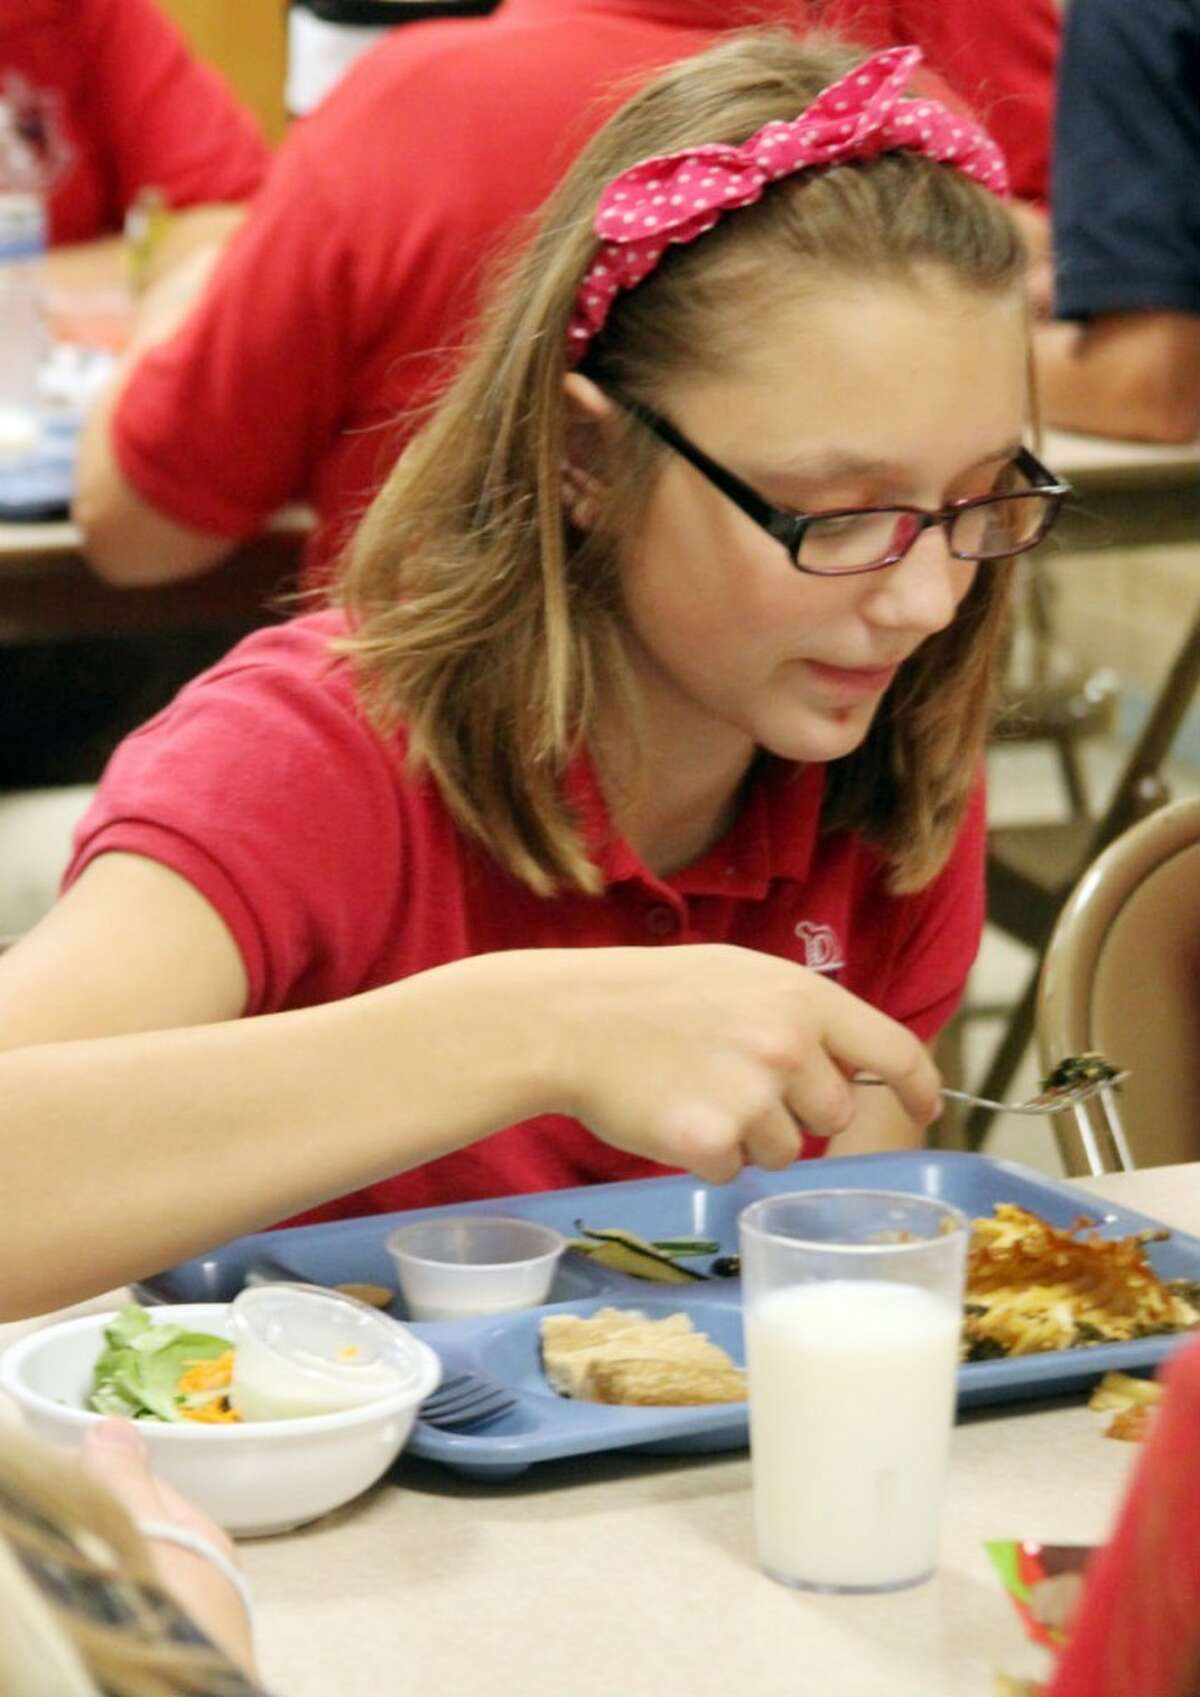 Emily Golembiewski samples the lasagna prepared by Community Kitchen staff (Meg LeDuc/News Advocate).